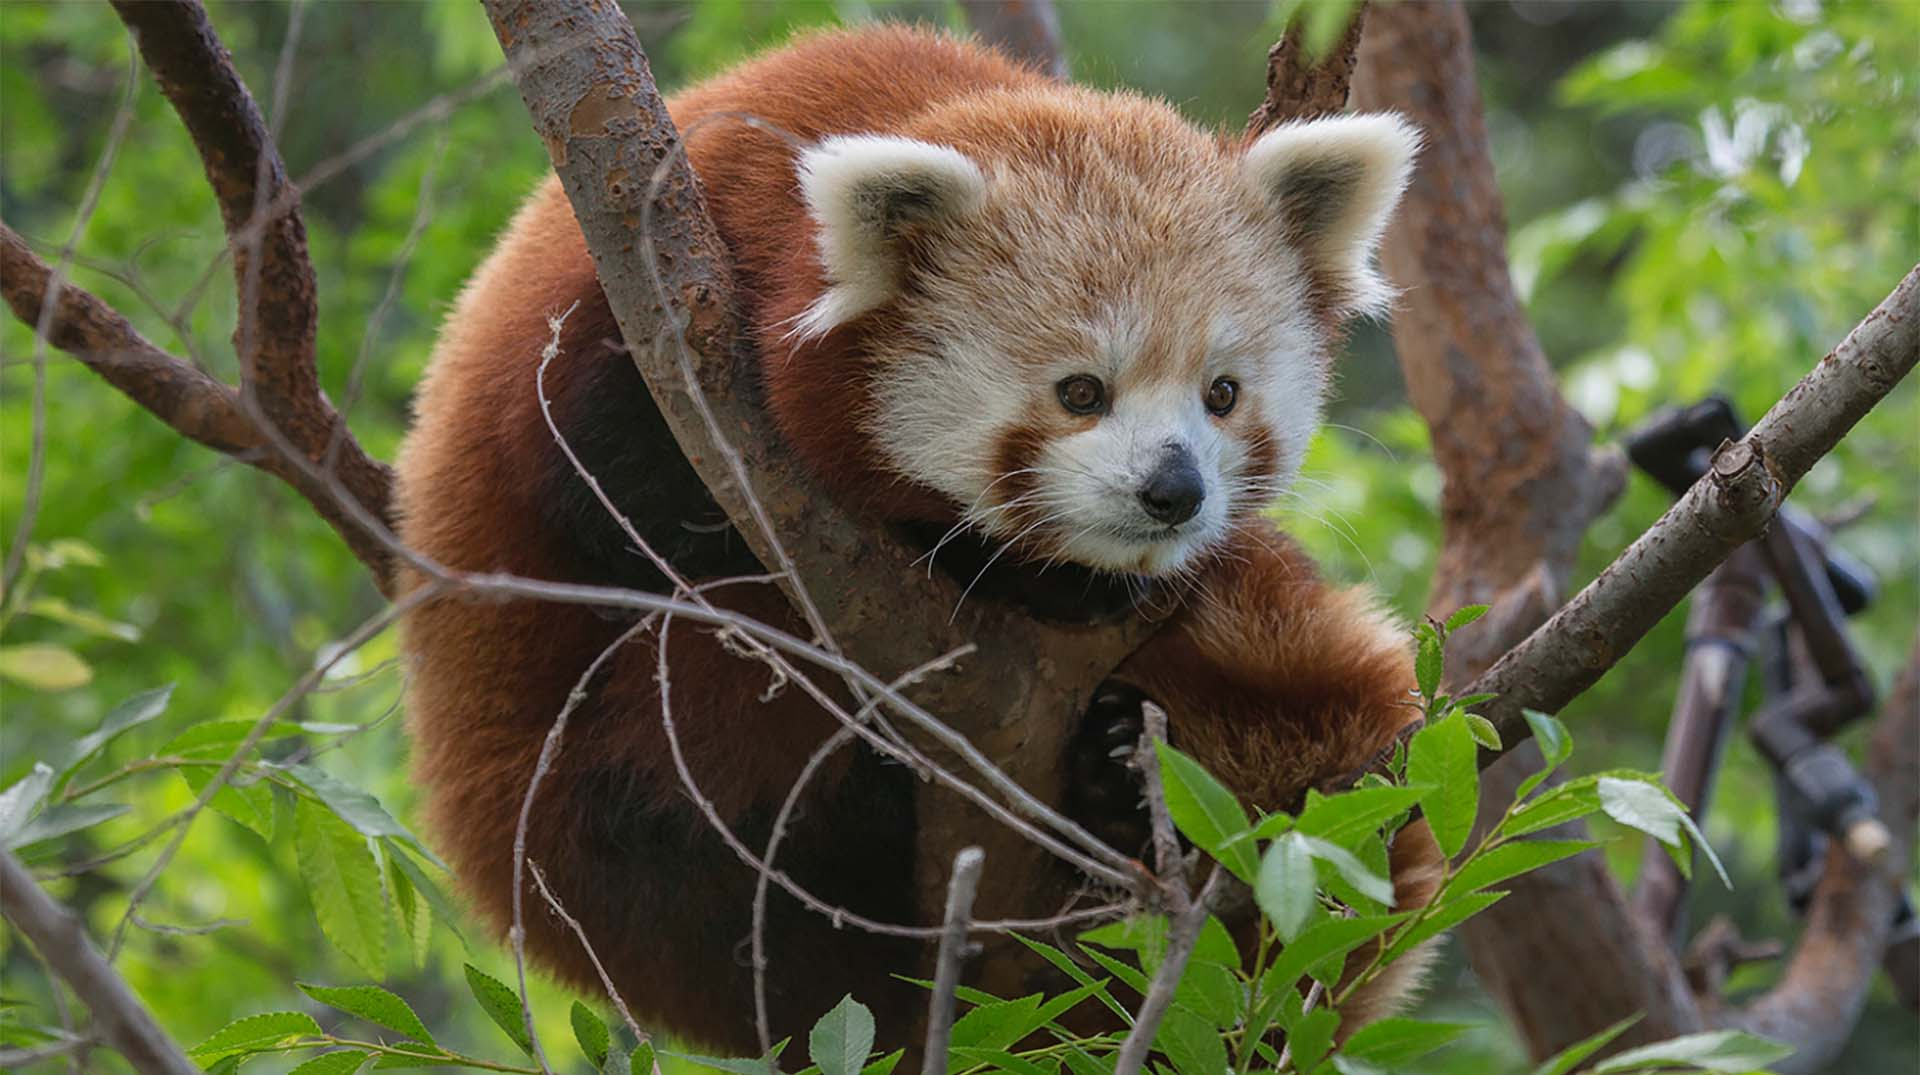 panda animals zoo diego san animal sandiegozoo redpanda spectrum across kingdom plants